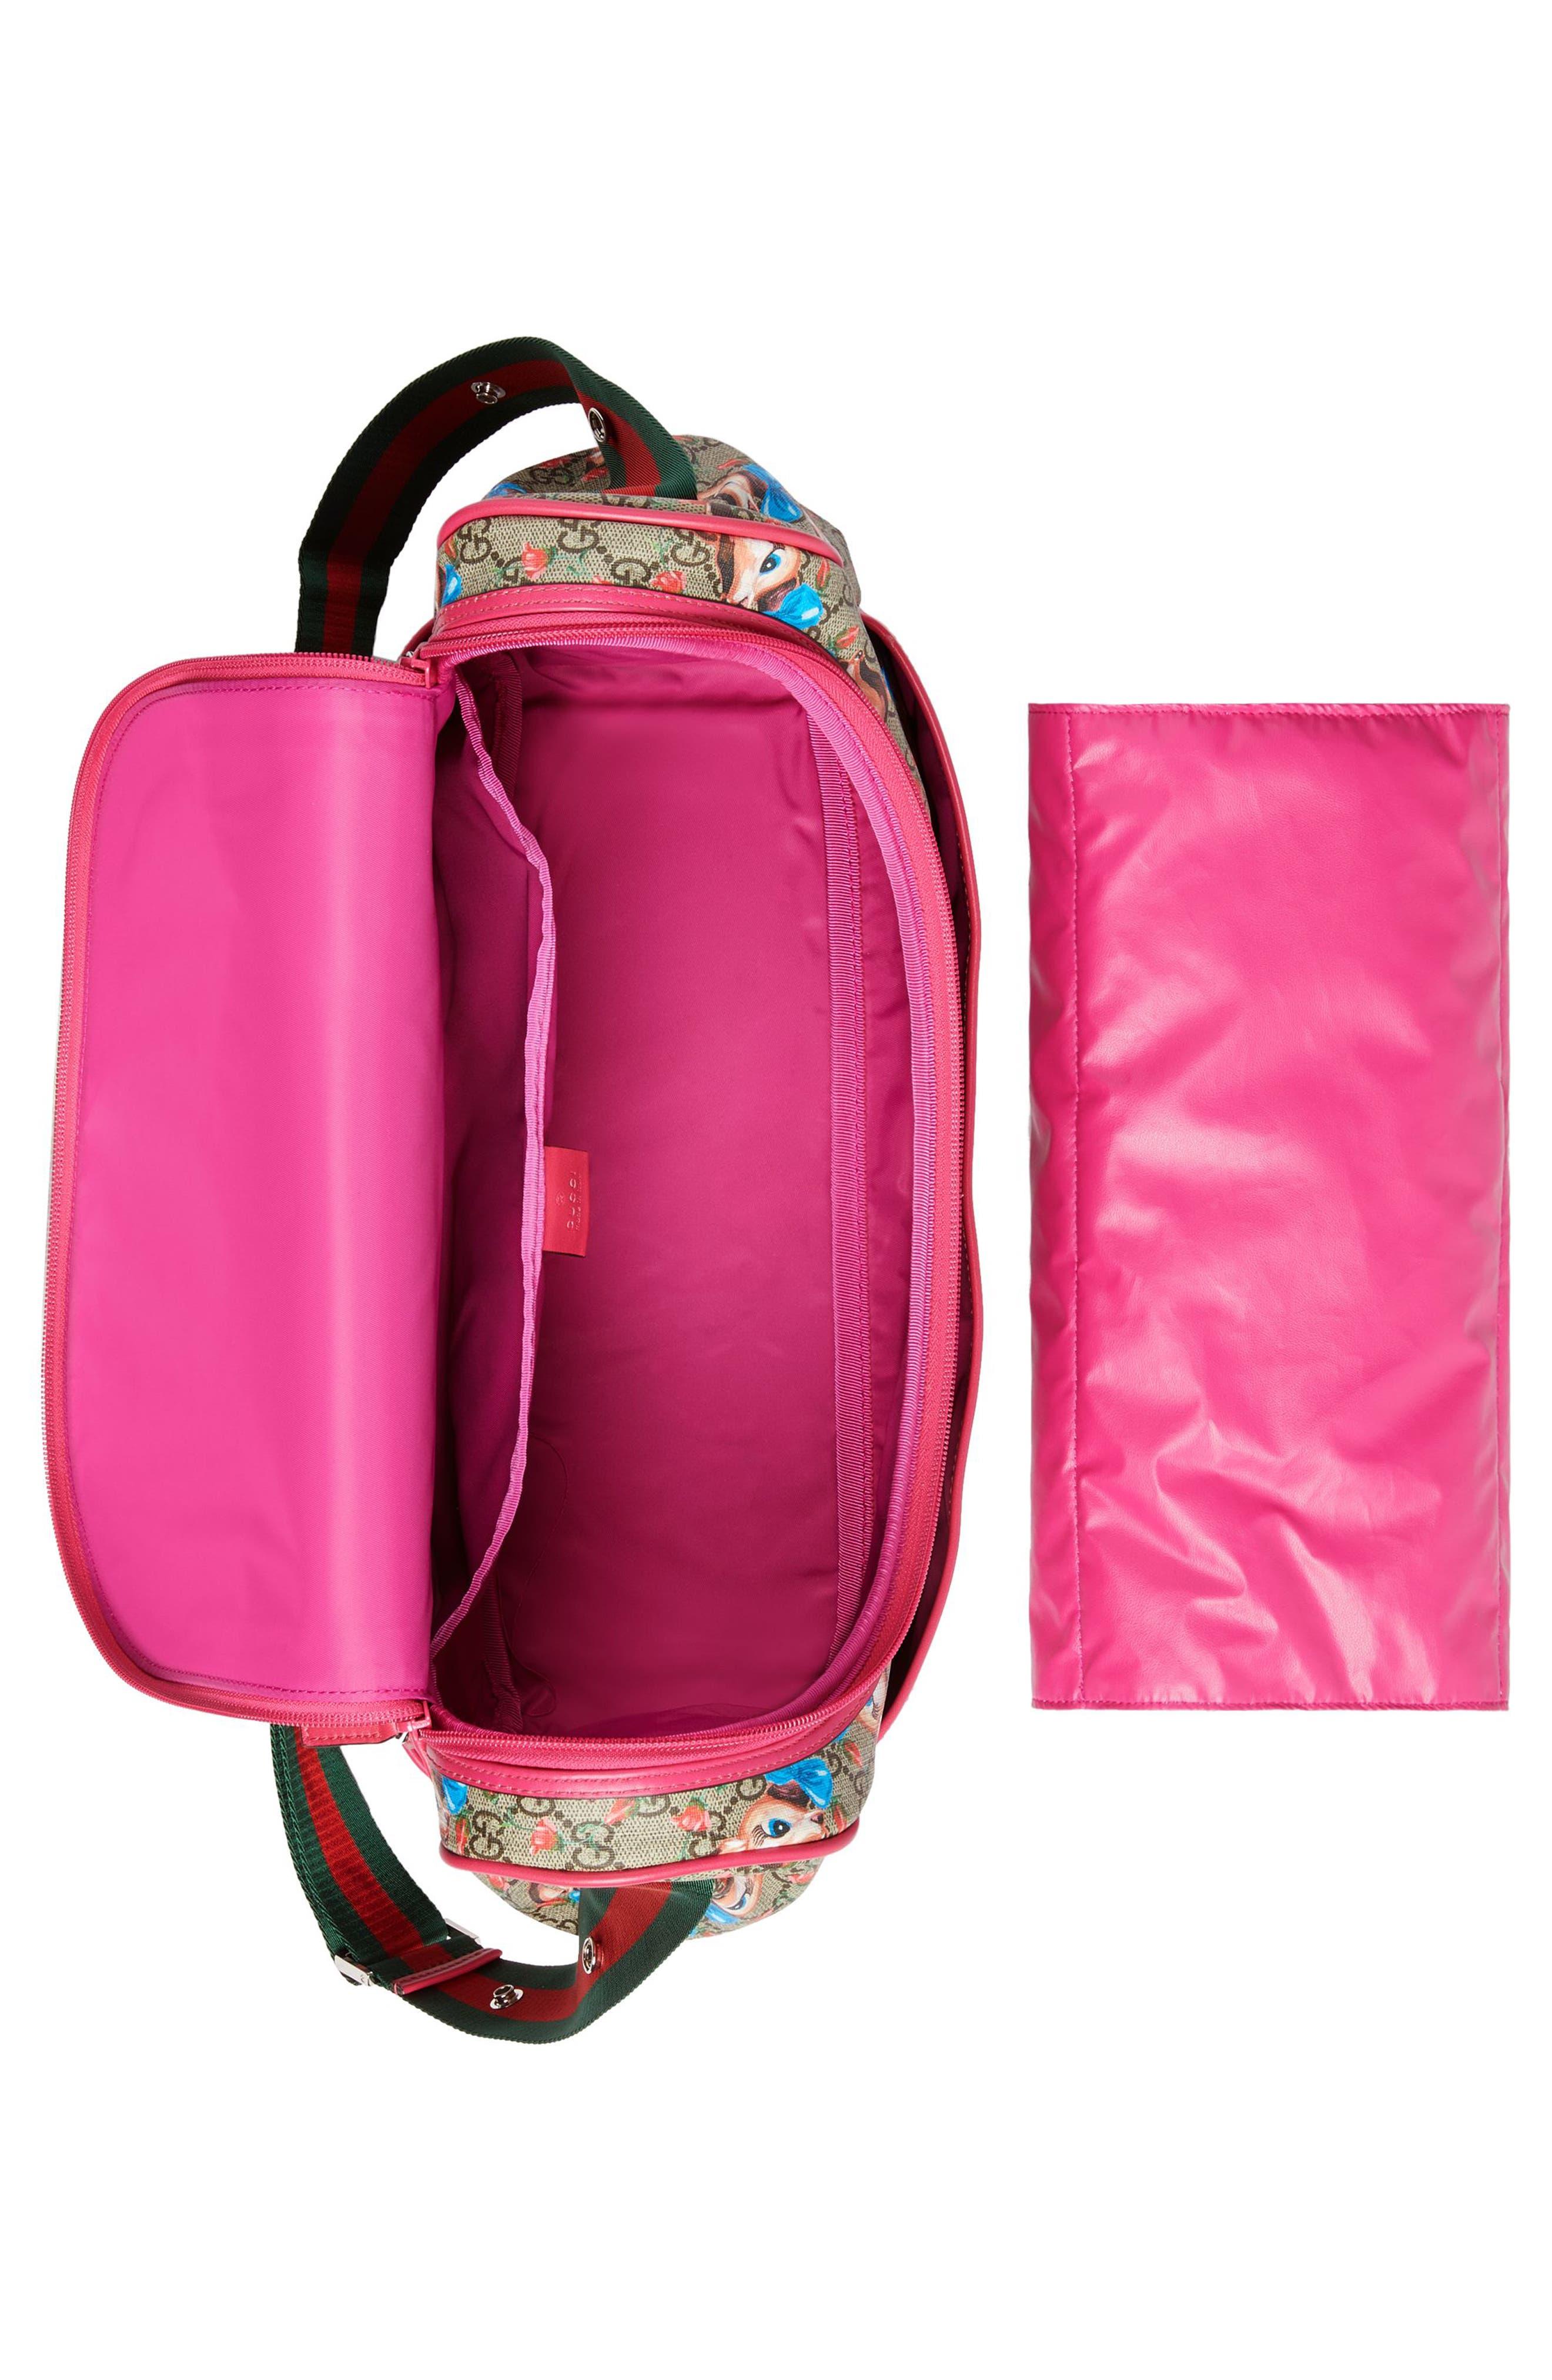 Deer & Rose Bud GG Supreme Canvas Diaper Bag,                             Alternate thumbnail 3, color,                             250